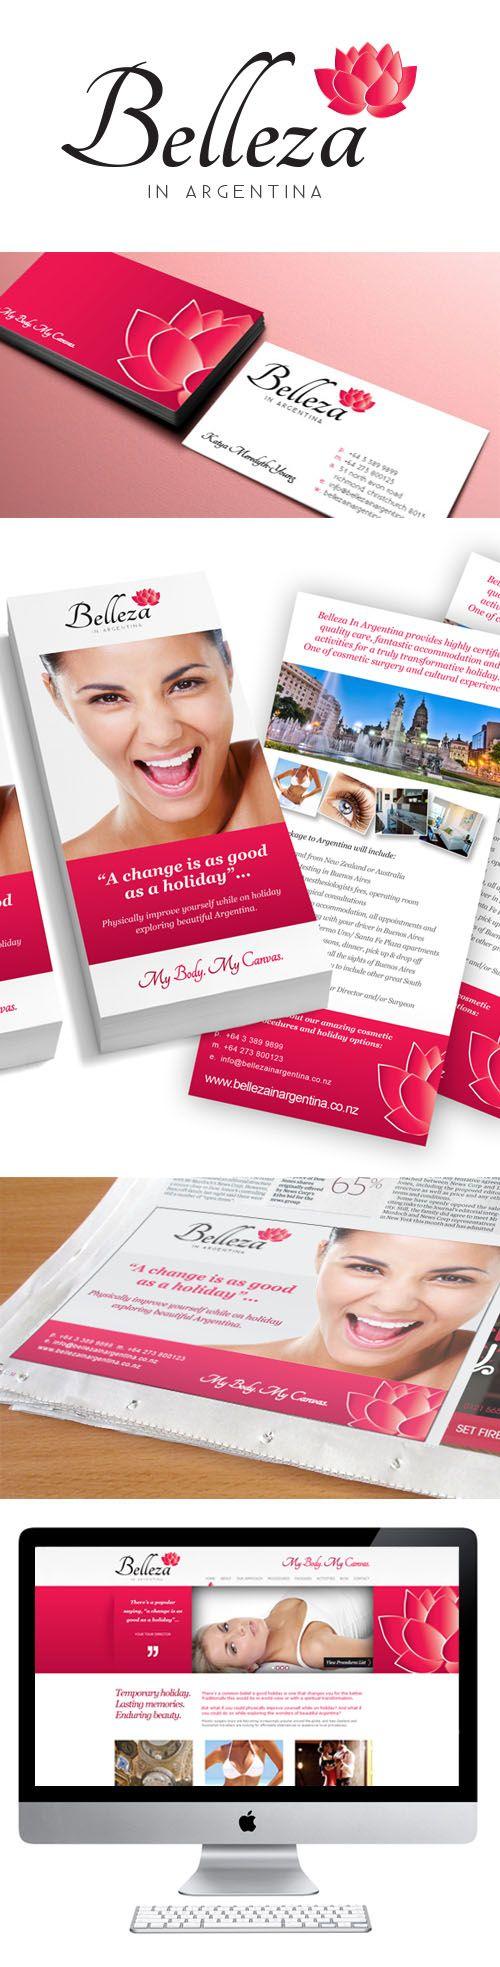 Belleza in Argentina branding, business card, flyer, advert and website design.